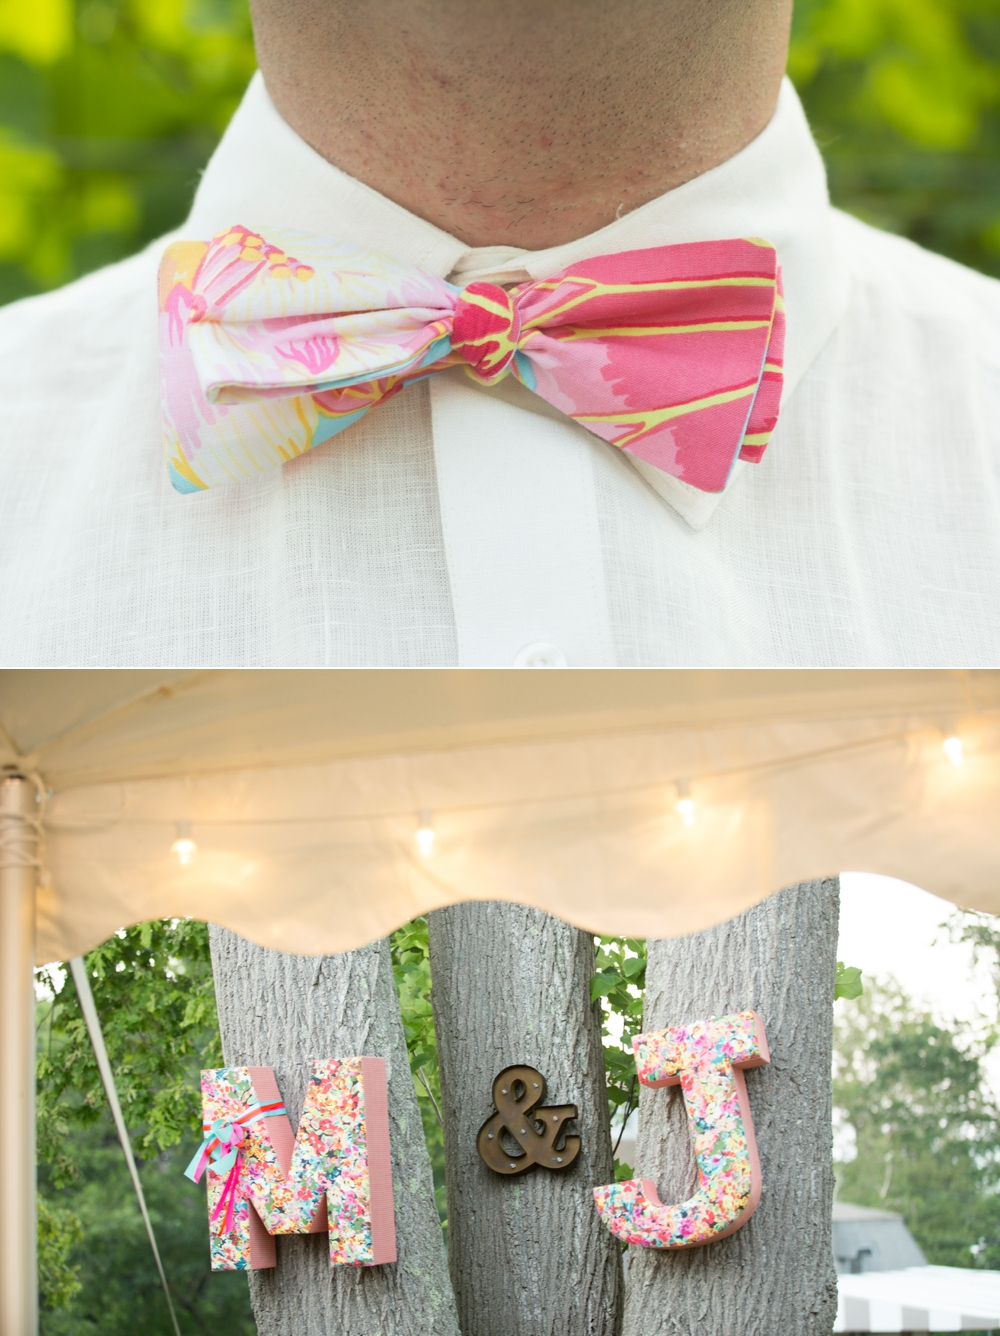 GreenvaleVineyards_Wedding_Missy&Joe_0034.jpg